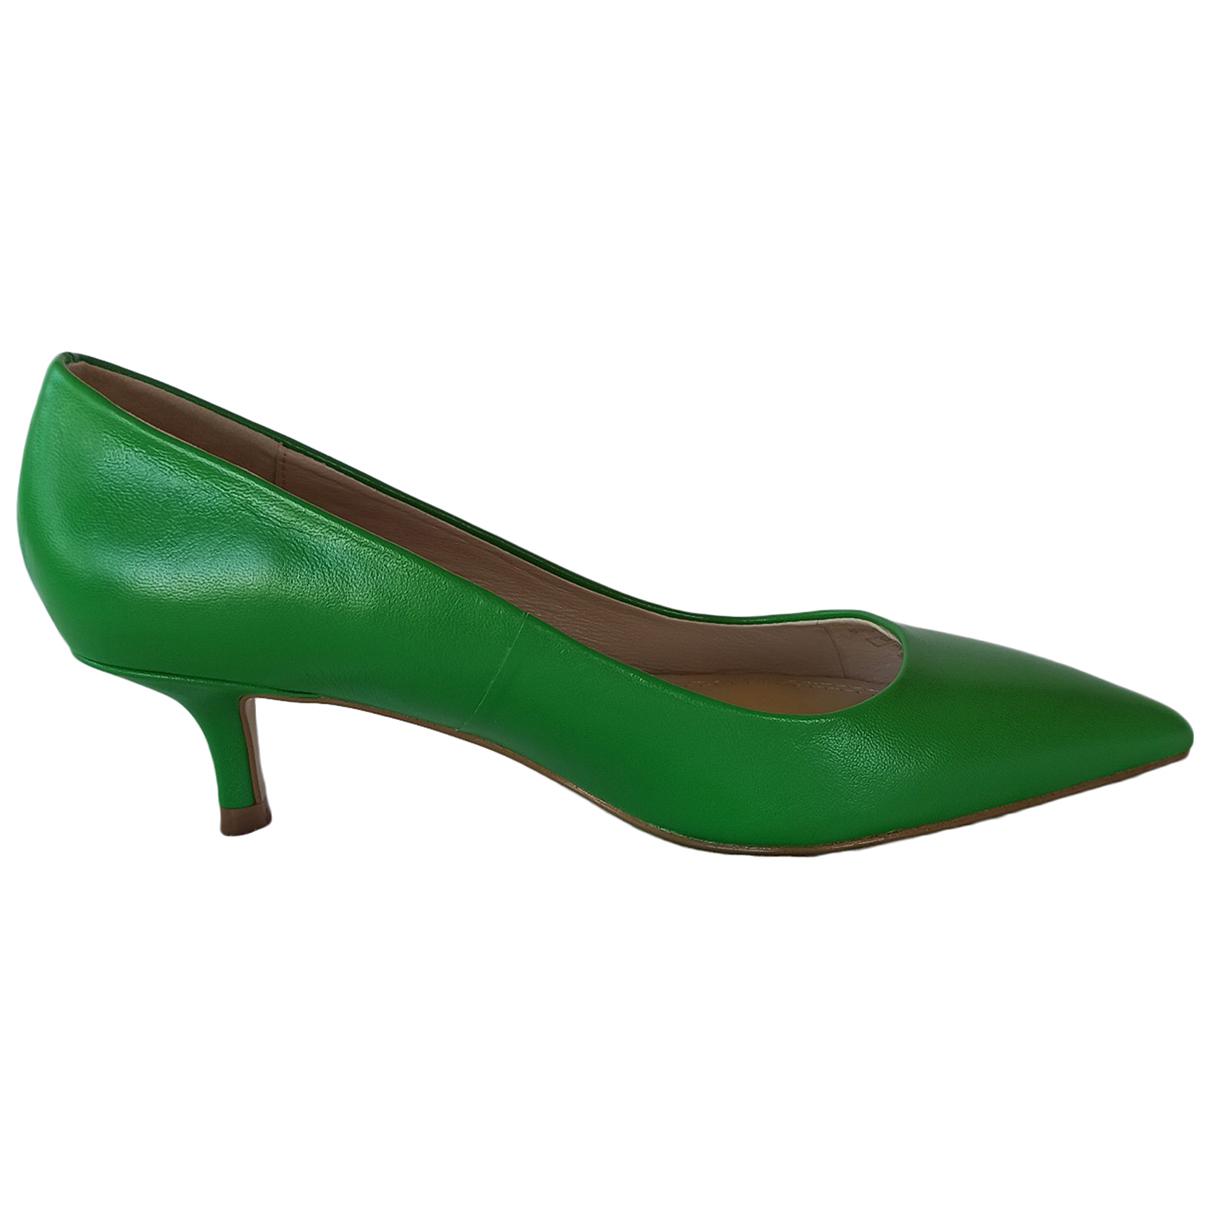 Zara - Escarpins   pour femme en cuir - vert